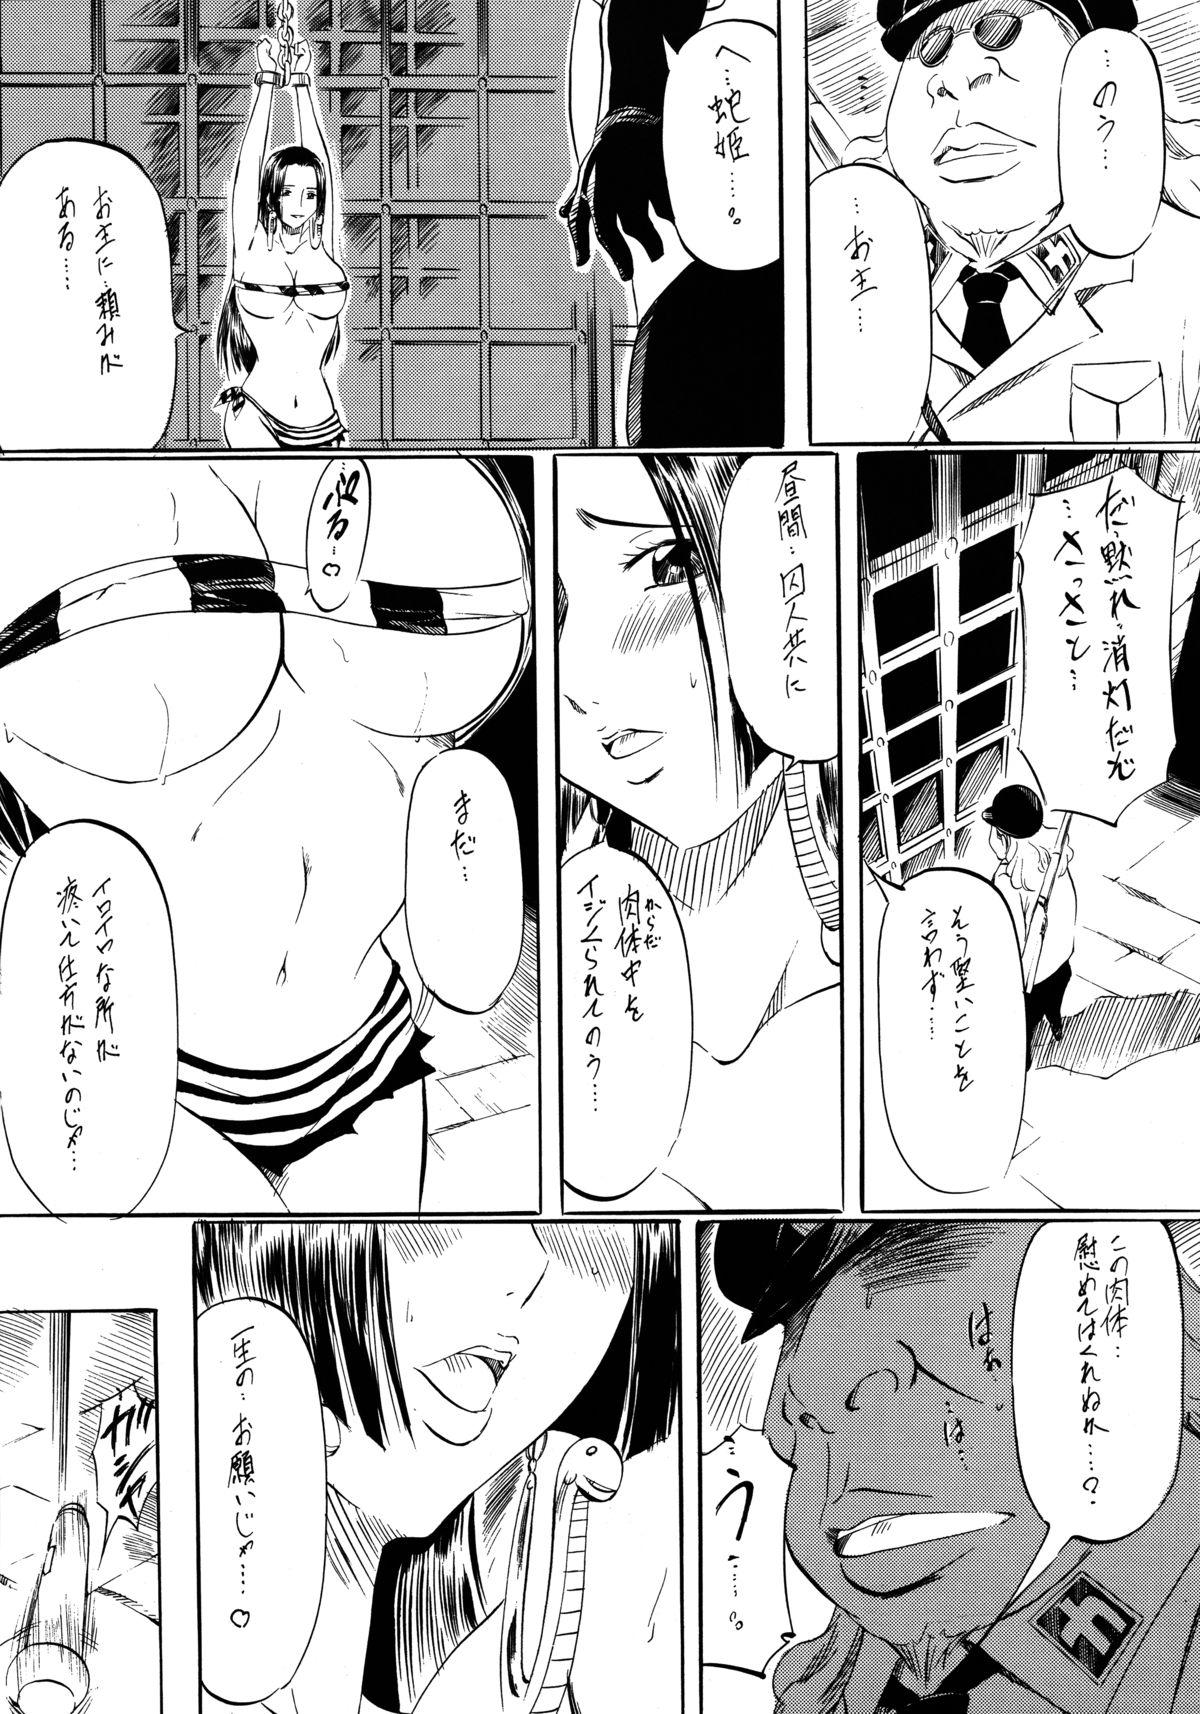 "[Busou Megami (Kannaduki Kanna)] Busou Megami Archives Series 1 ""Piece of Girl's ~Hancock Hen~"" (One Piece) 21"